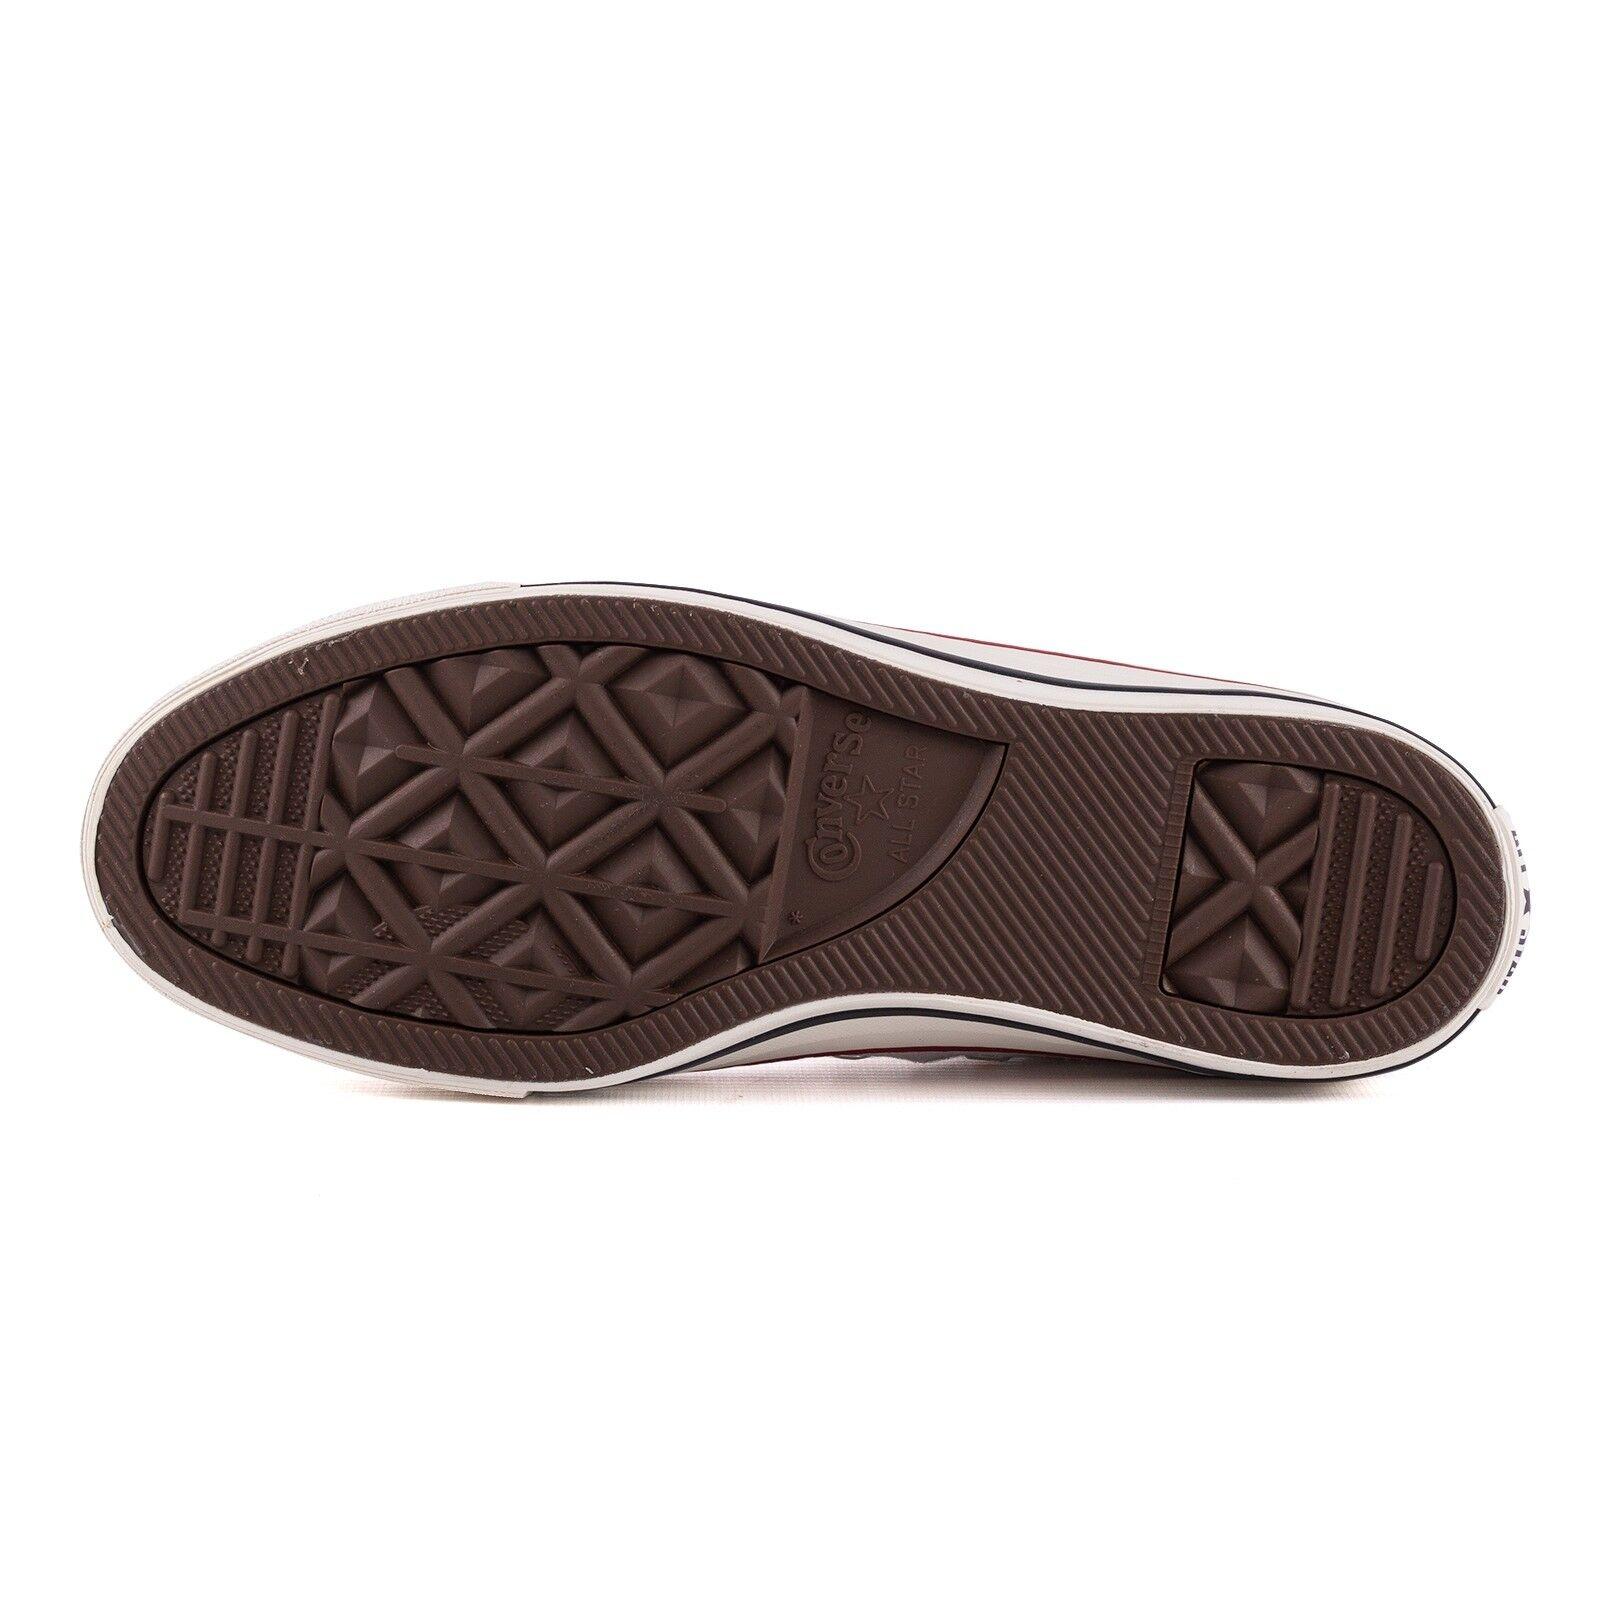 Converse Ctas OX Dark Schuhe Stucco Schuhe Dark unisex Sneaker Grün 51424 7e147f